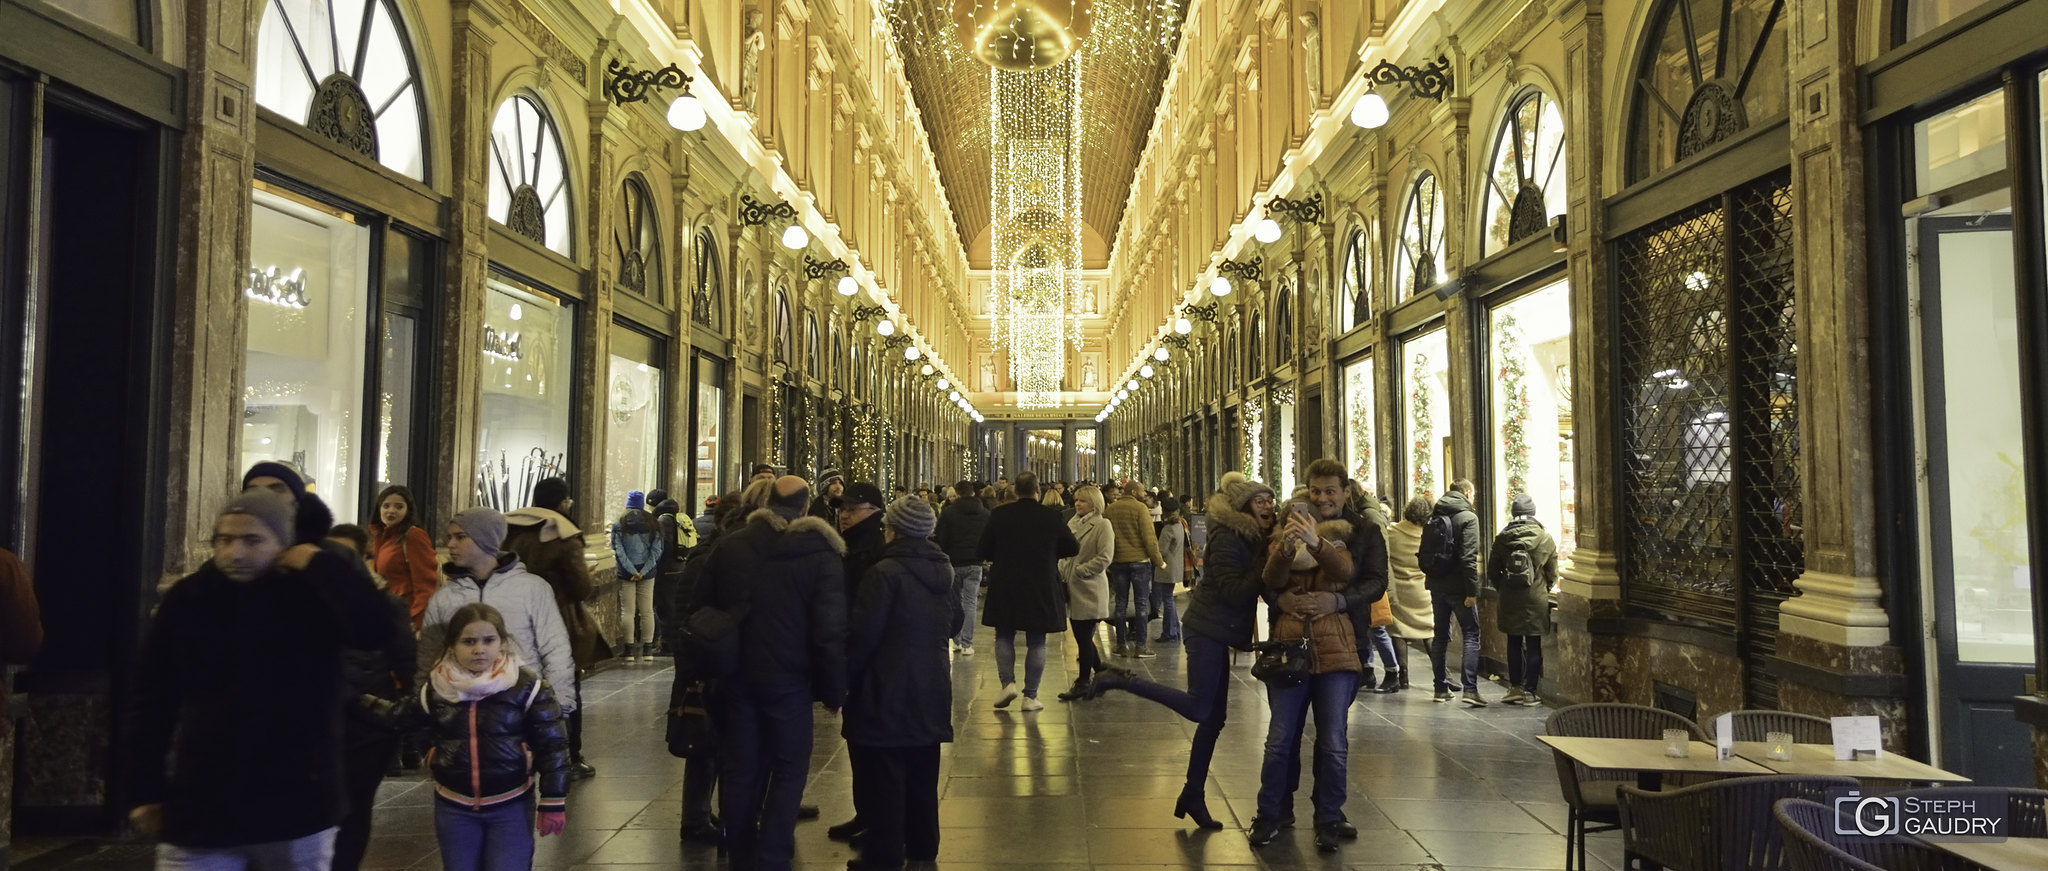 Galeries Royales St Hubert à Bruxelles [Klik om de diavoorstelling te starten]